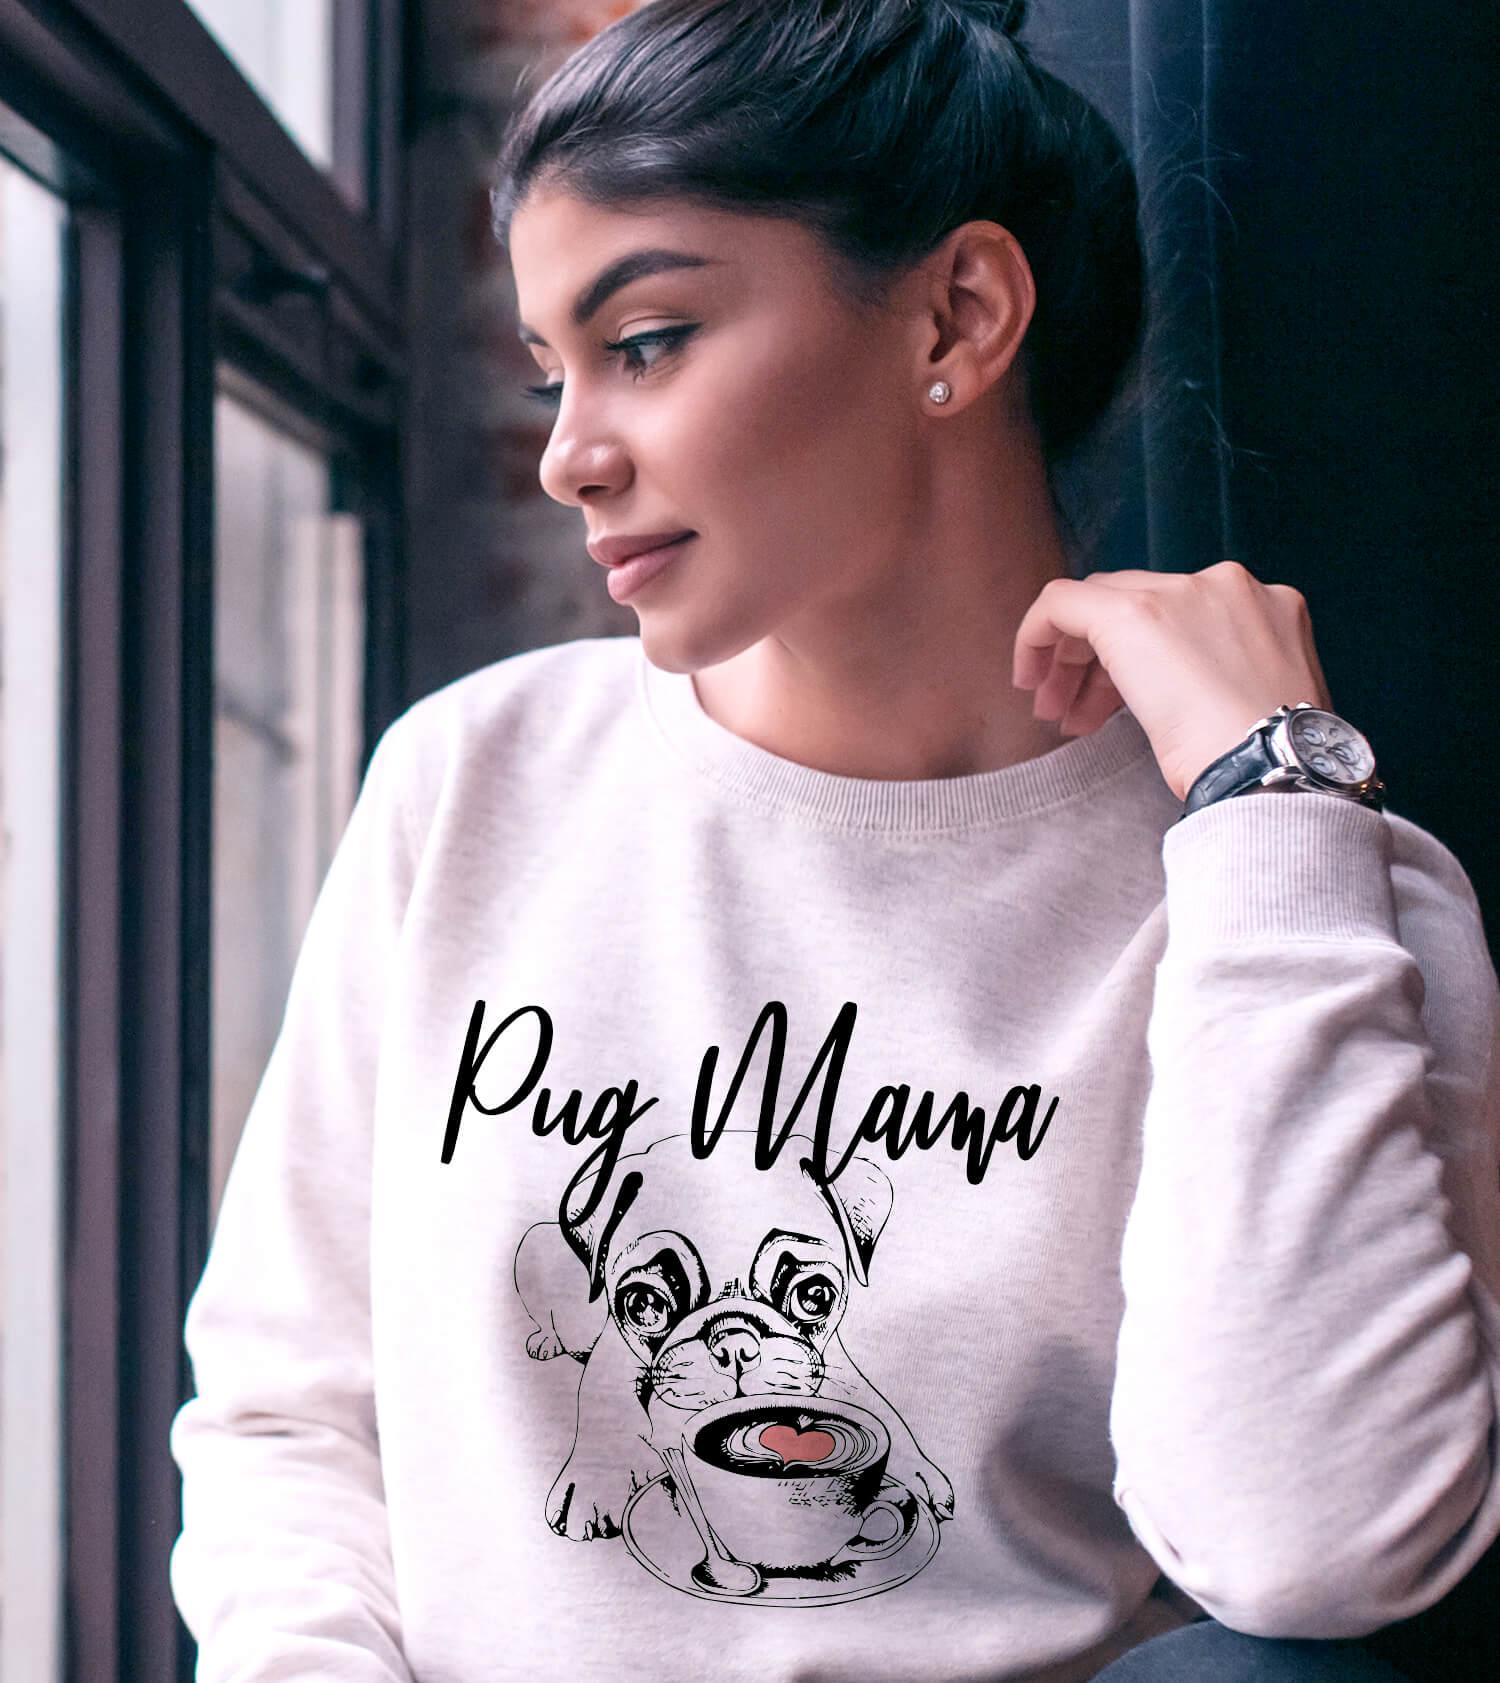 Pug Mama Sweater - Pug Lover Gift